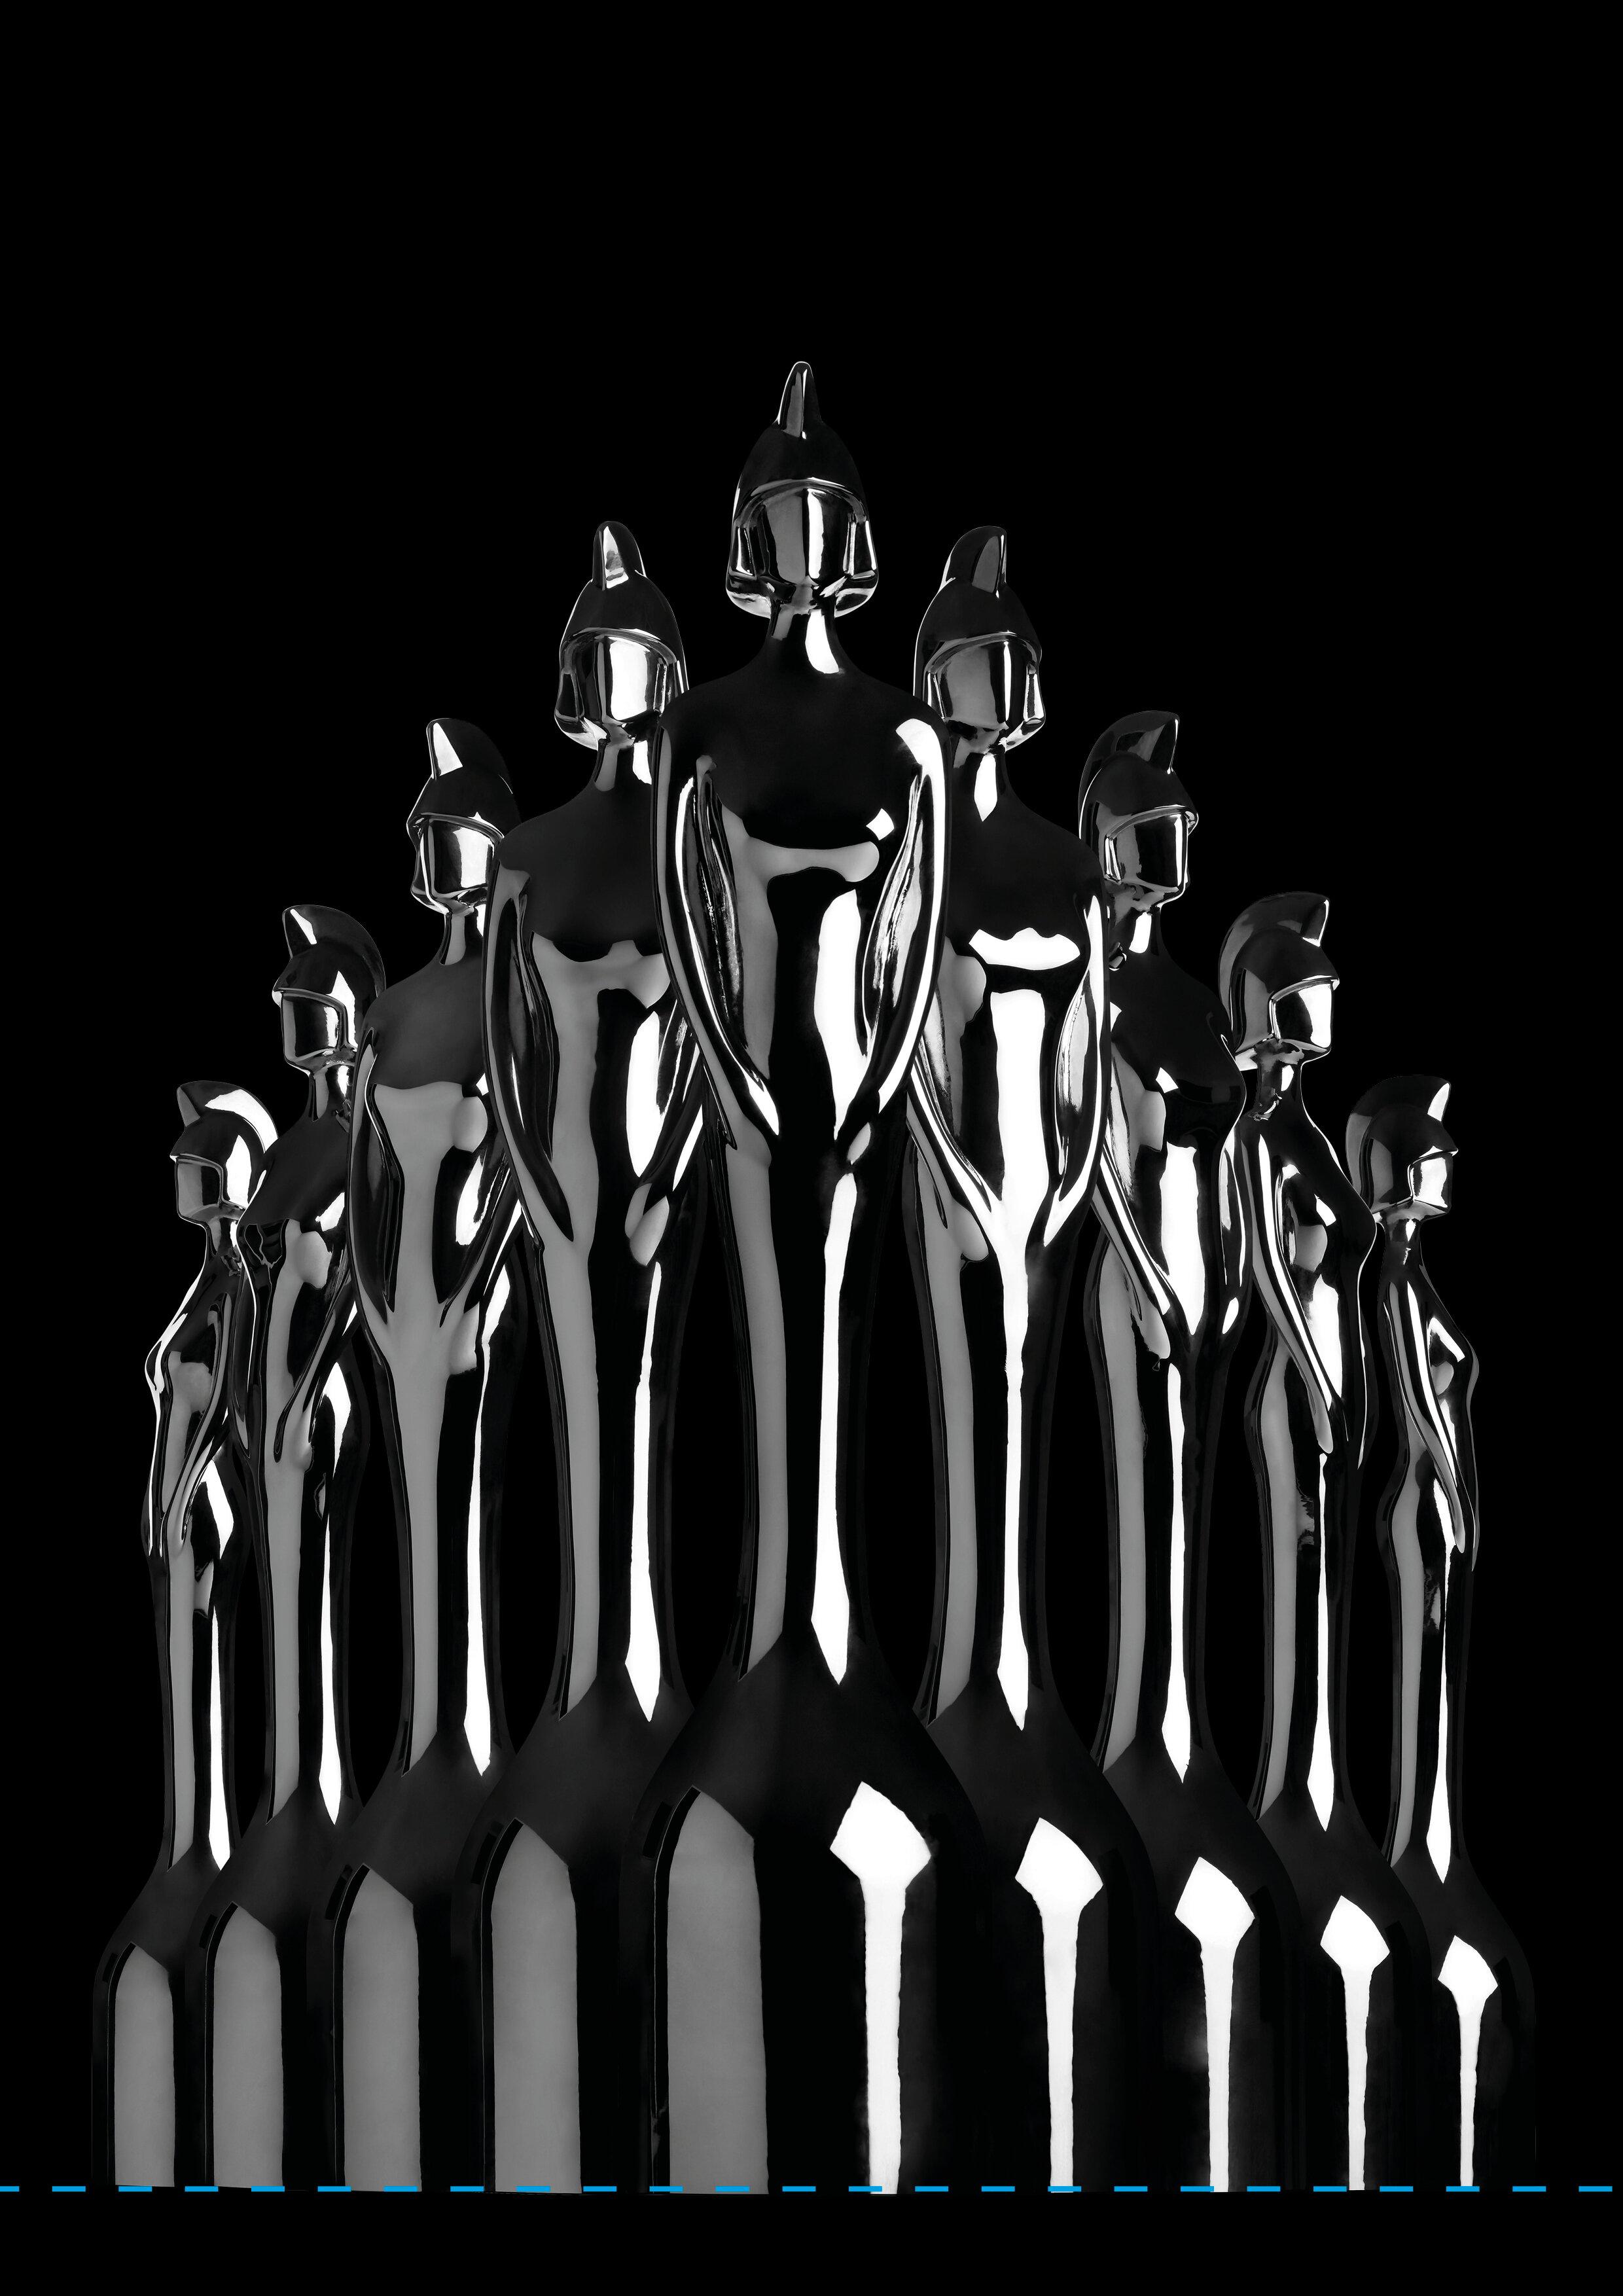 Full length trophy group